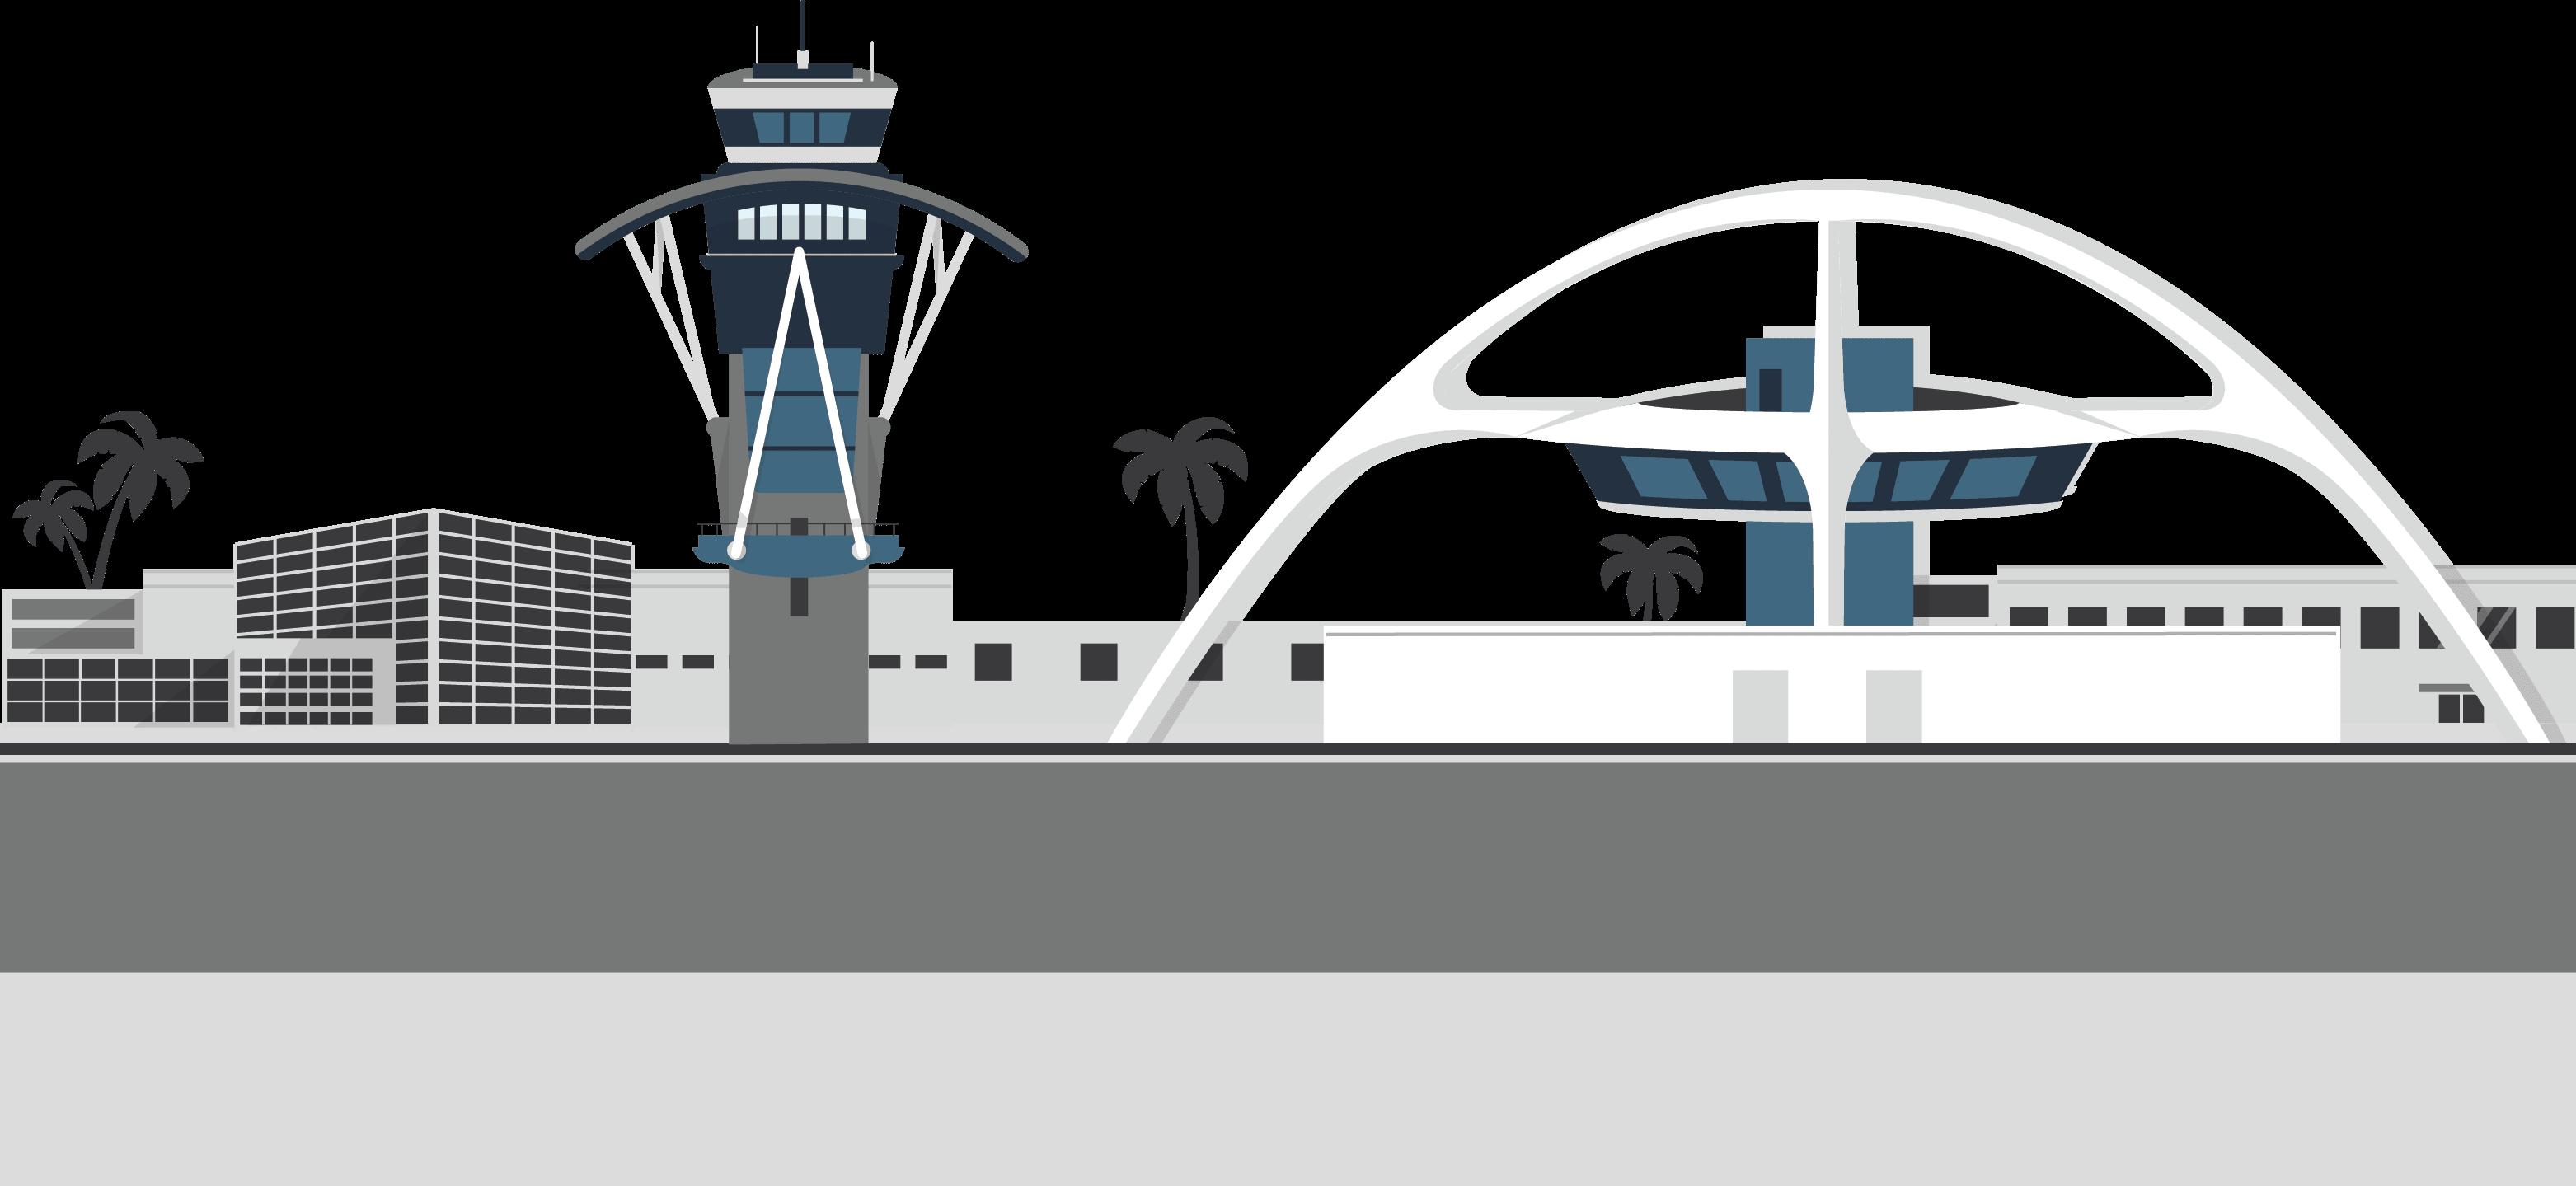 LAX Taxi Service